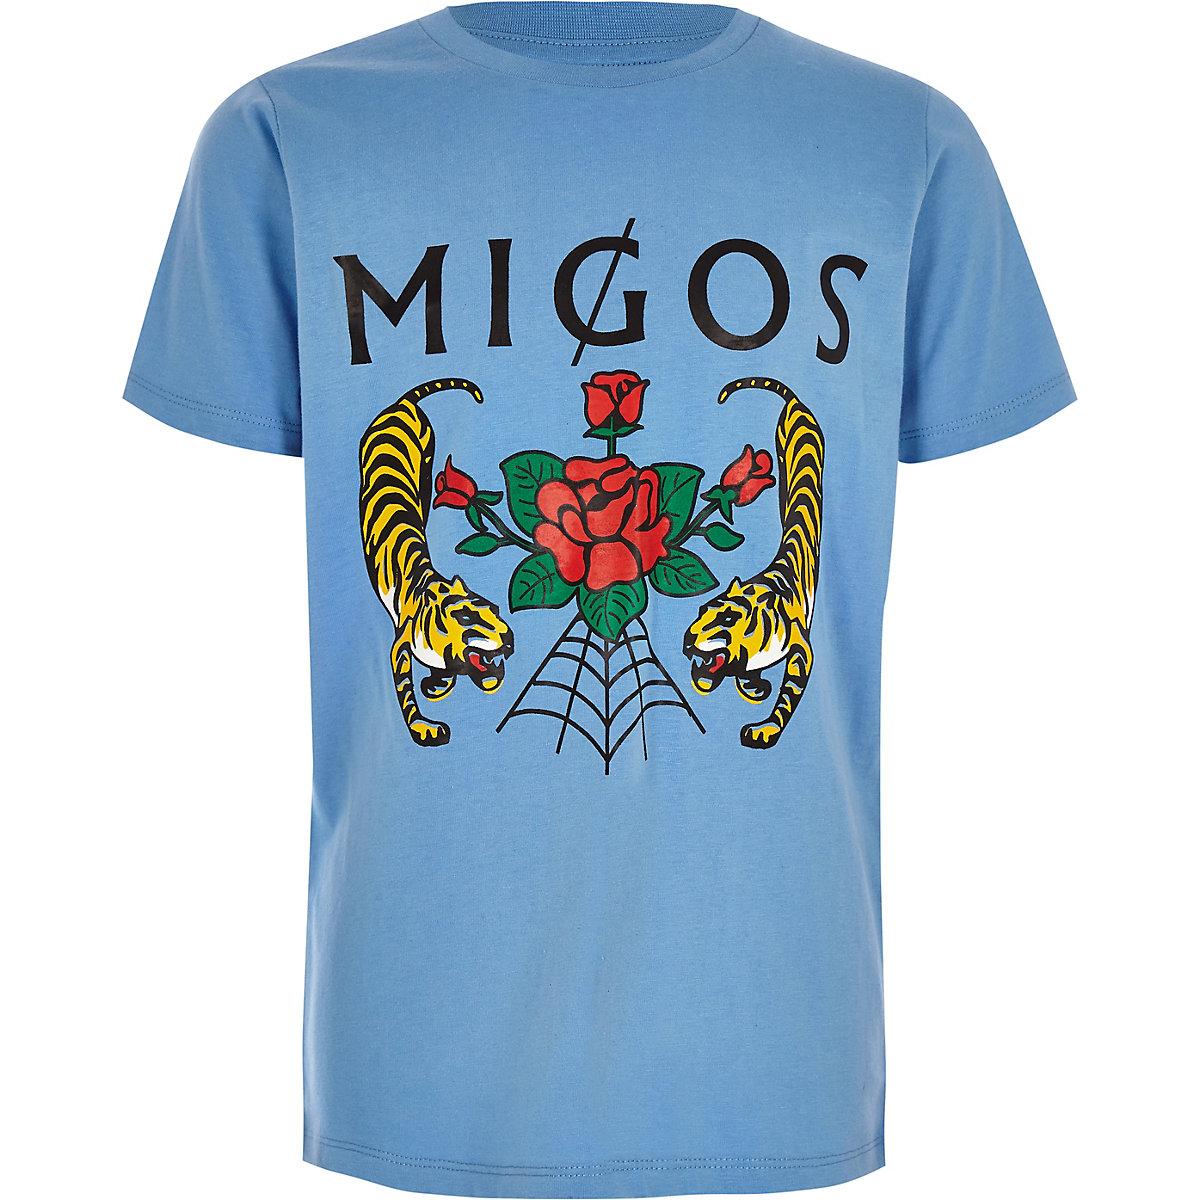 Boys 'migos' blue rose print T-shirt